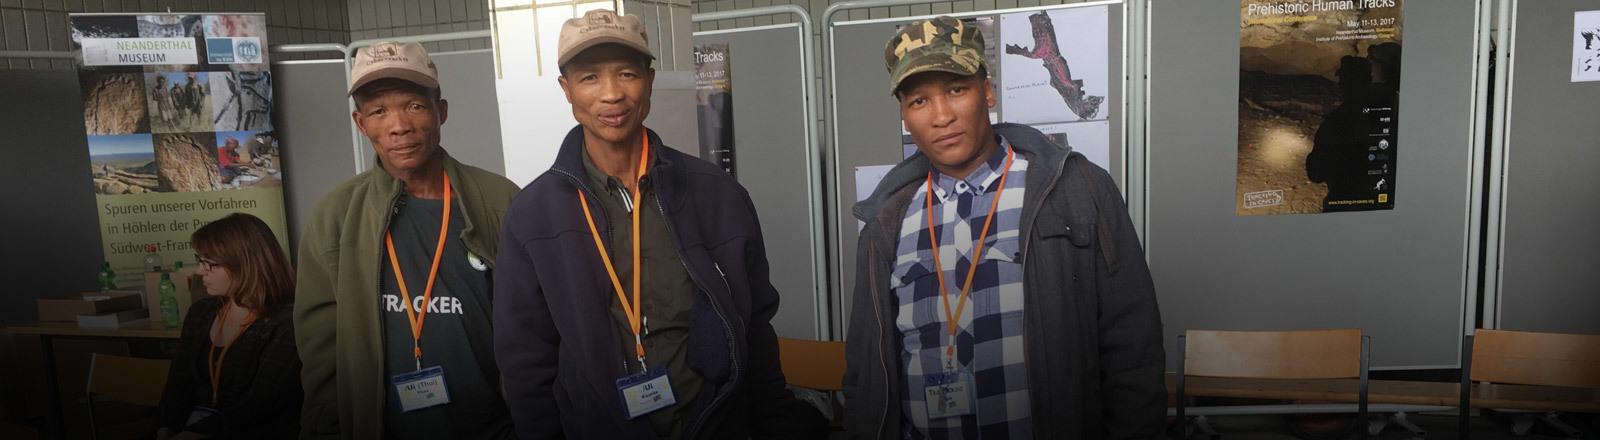 Drei San-Jäger aus Namibia